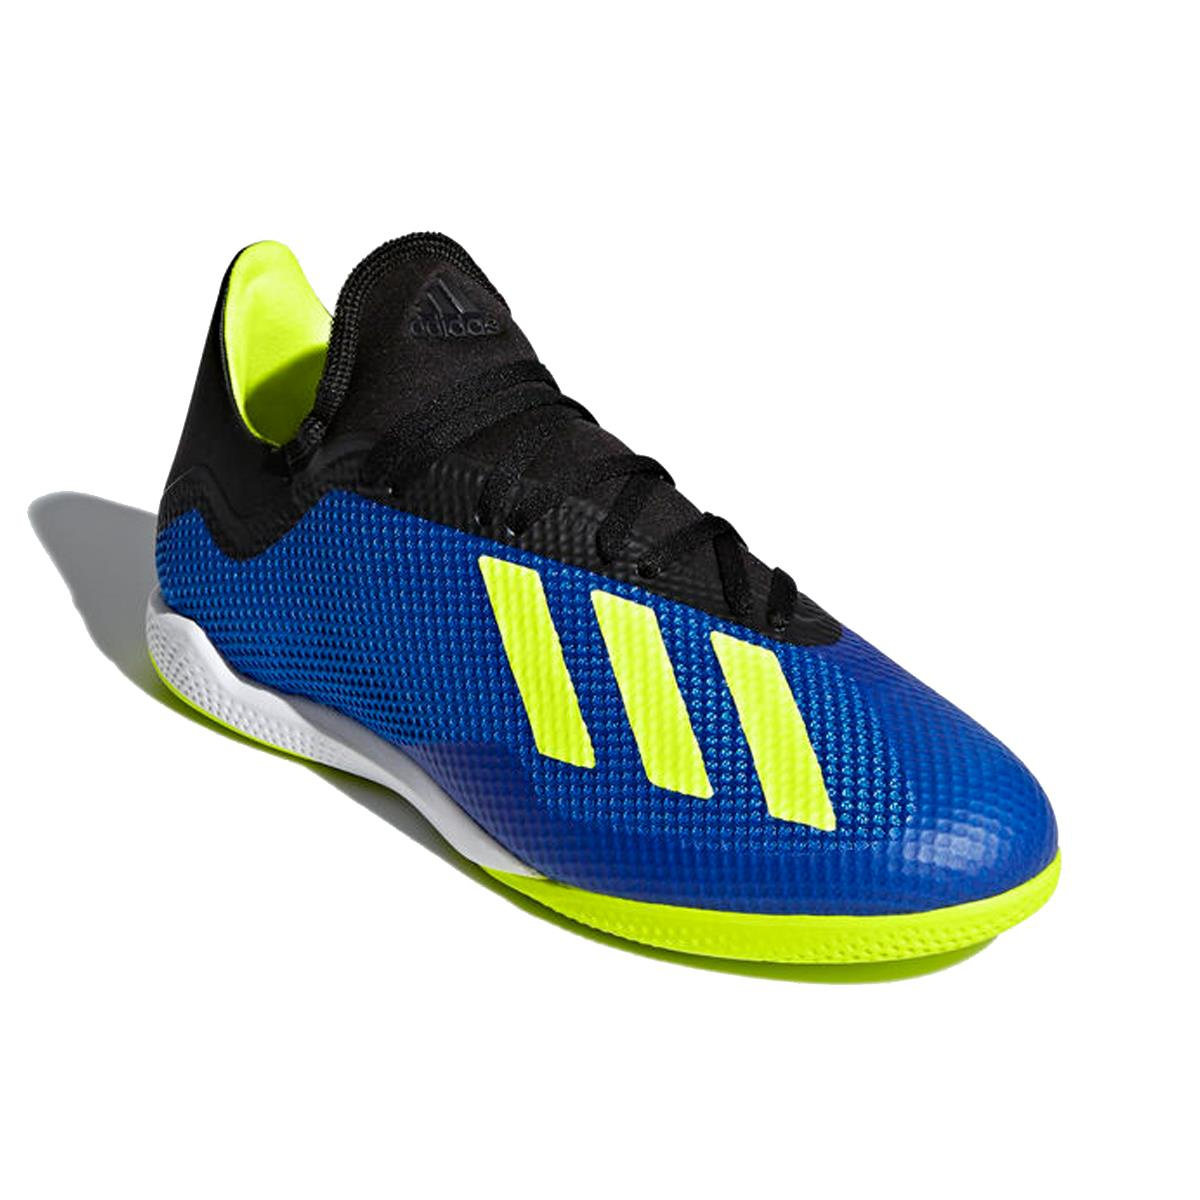 9d15b1d3a305e Chuteira Futsal Adidas X Tango 18.3 Masculina